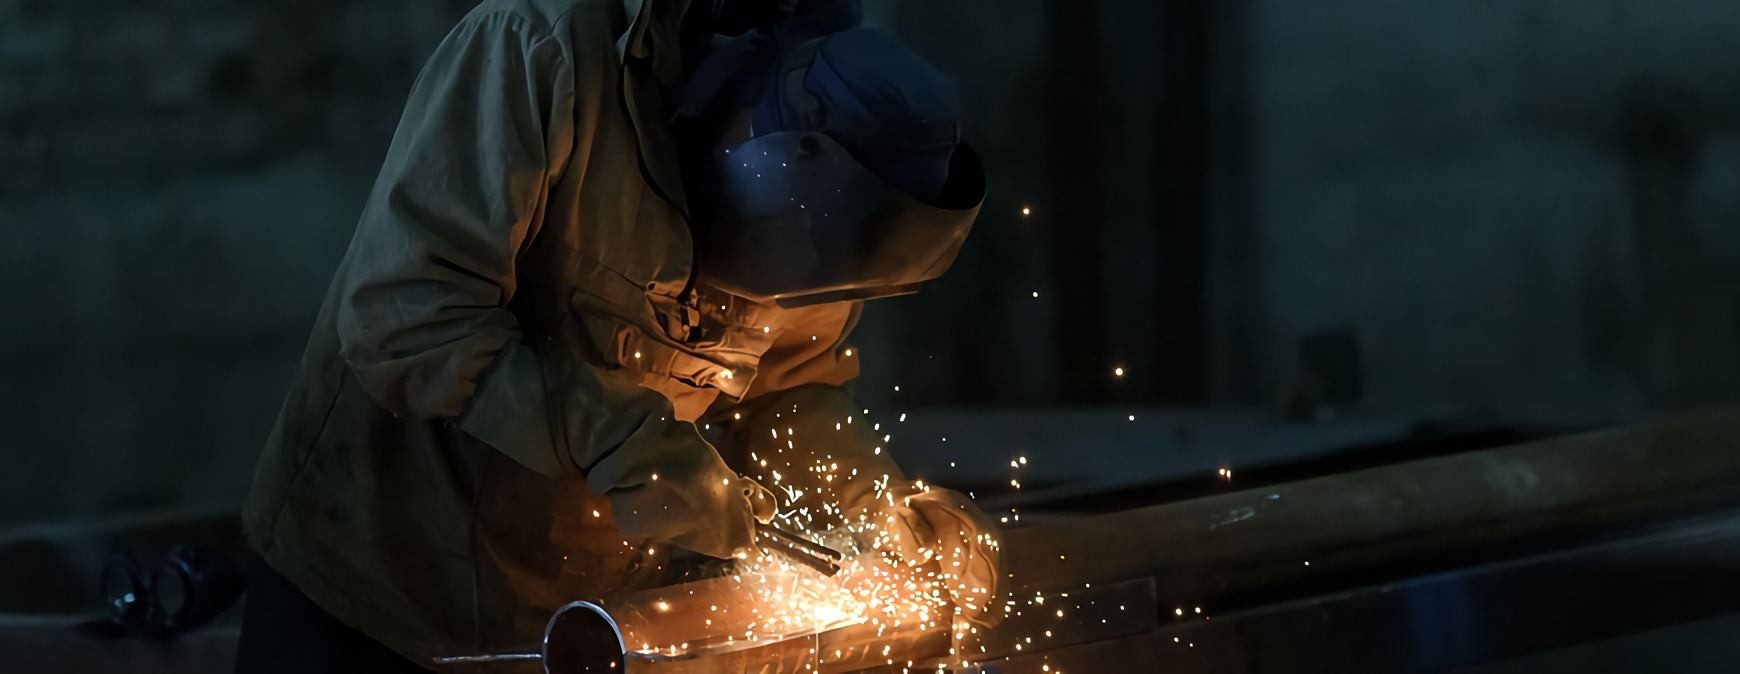 welding a pipe